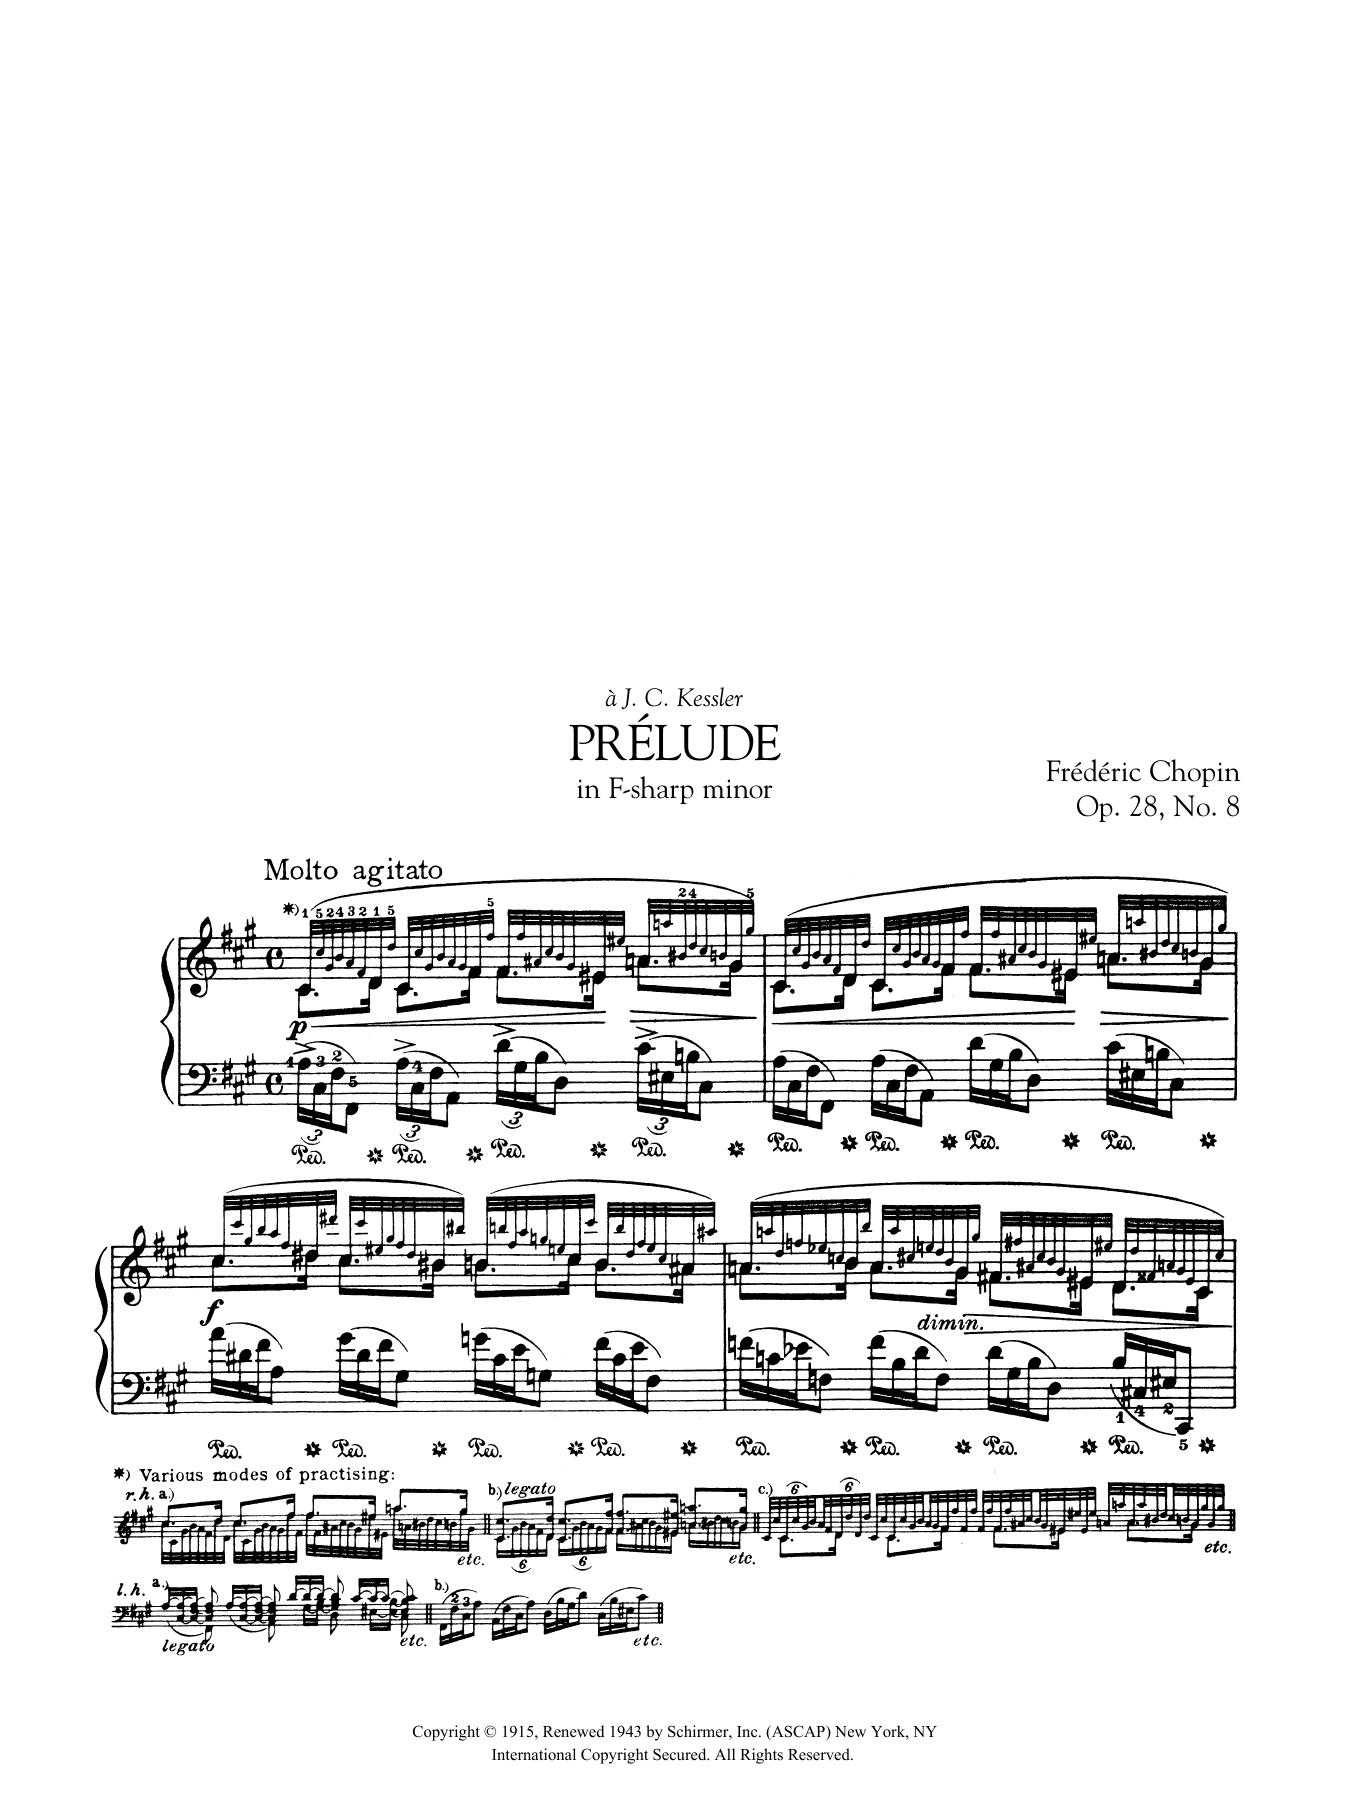 Prélude in F-sharp minor, Op. 28, No. 8 Sheet Music